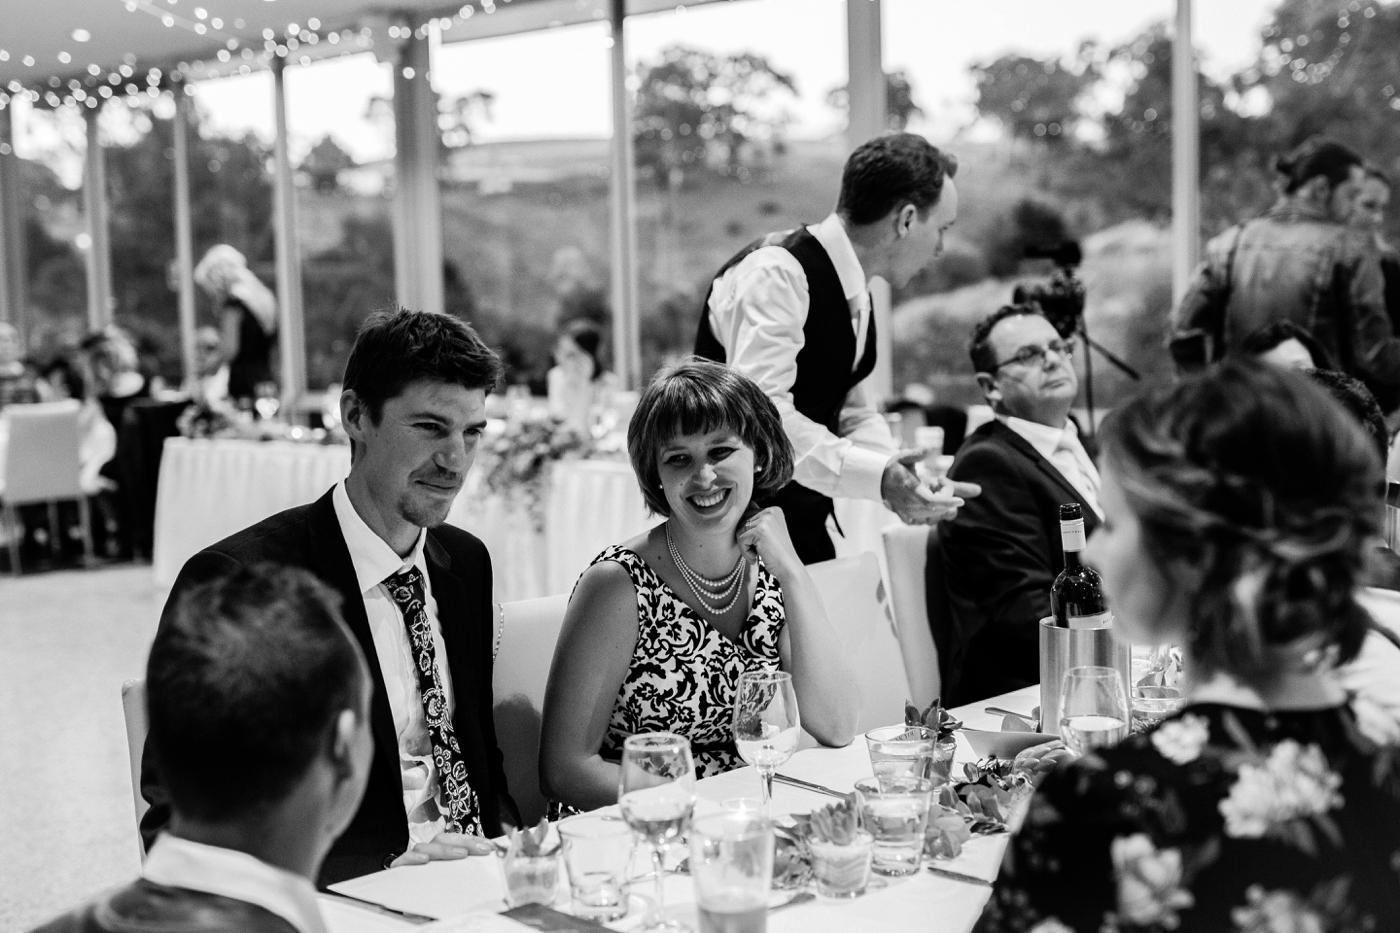 Jasmine and Adam - Natural wedding photographer in Adelaide - Candid Wedding Photographer Adelaide - www.katherineschultzphotography.com 60